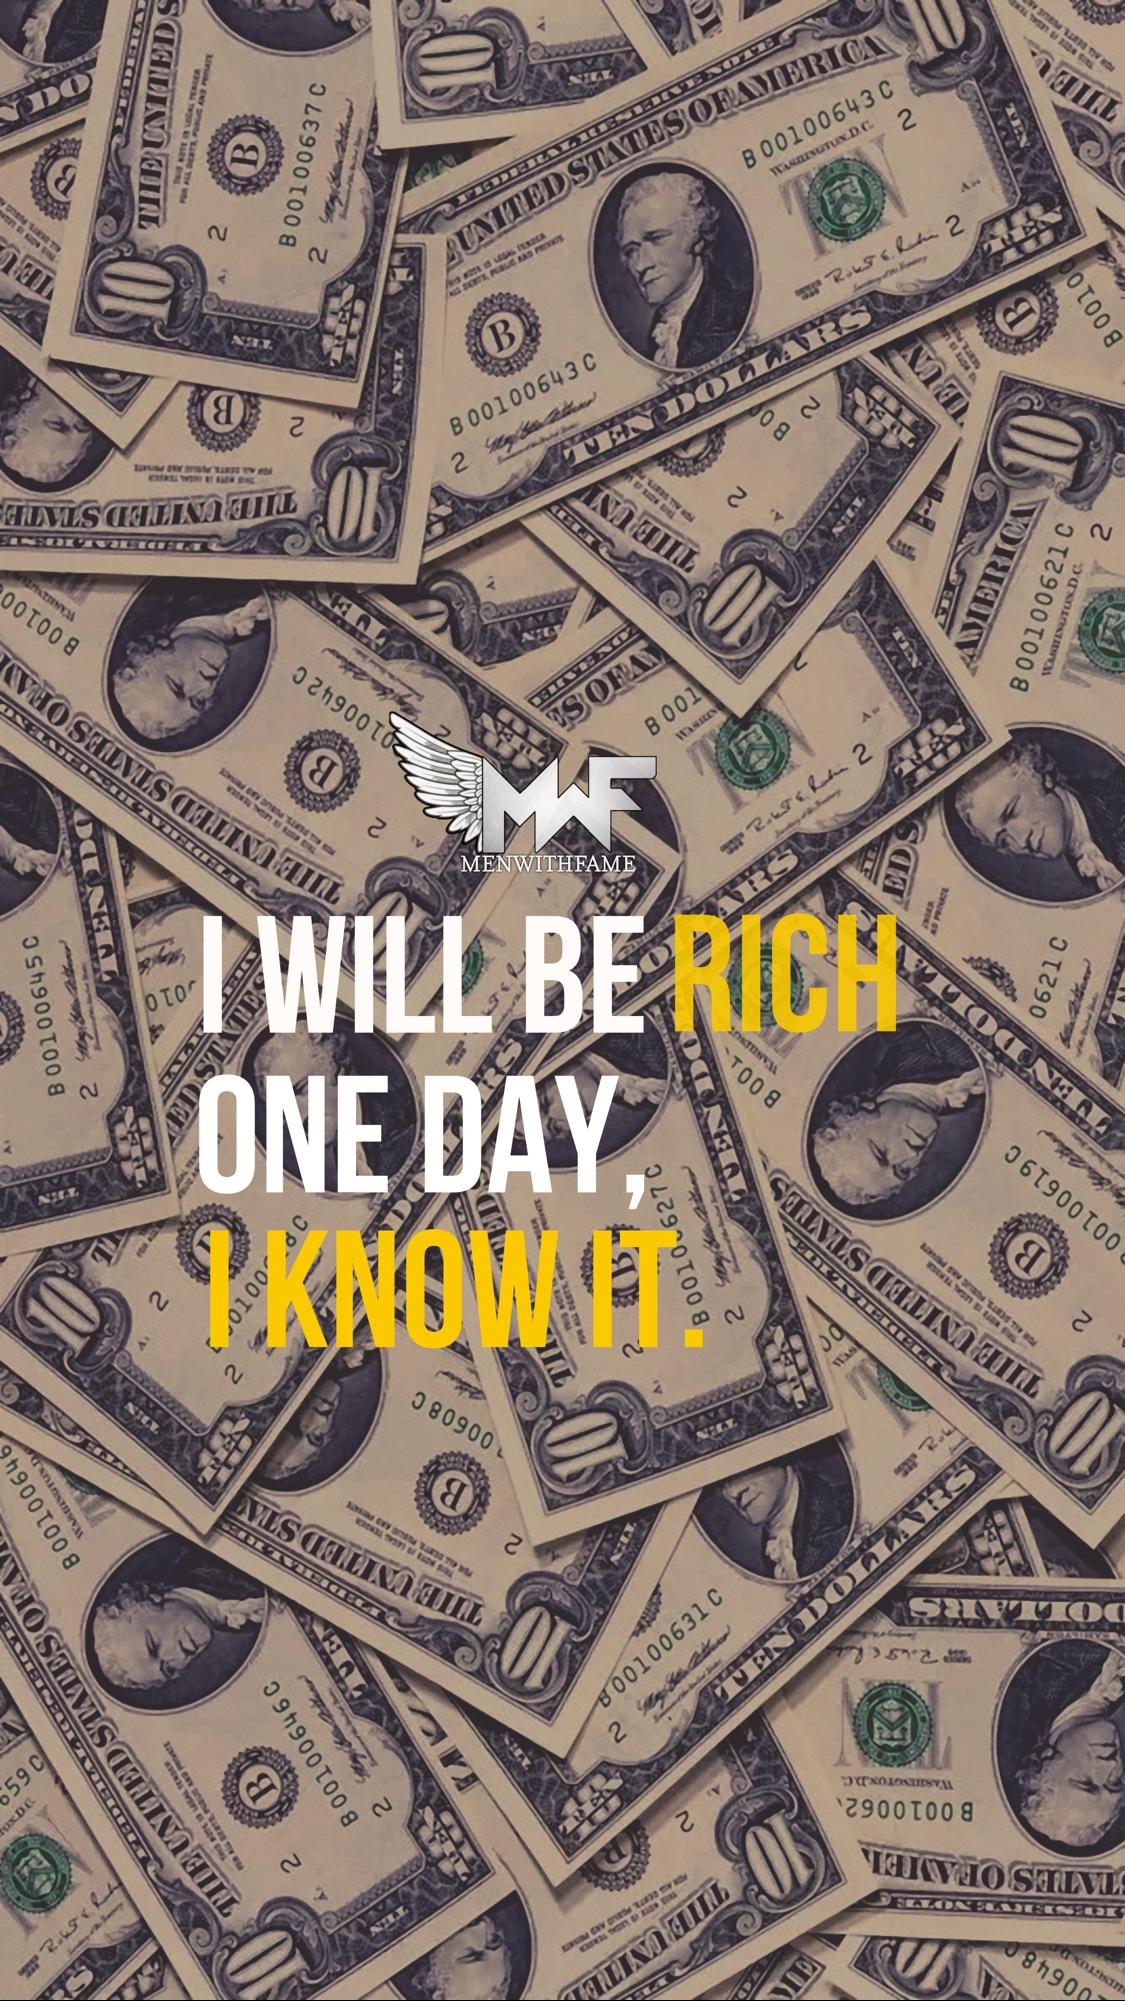 Motivation Money Wallpaper : motivation, money, wallpaper, MARIK.G-, STYLE, WALLPAPERS, Money, Wallpaper, Iphone,, Background,, Quotes